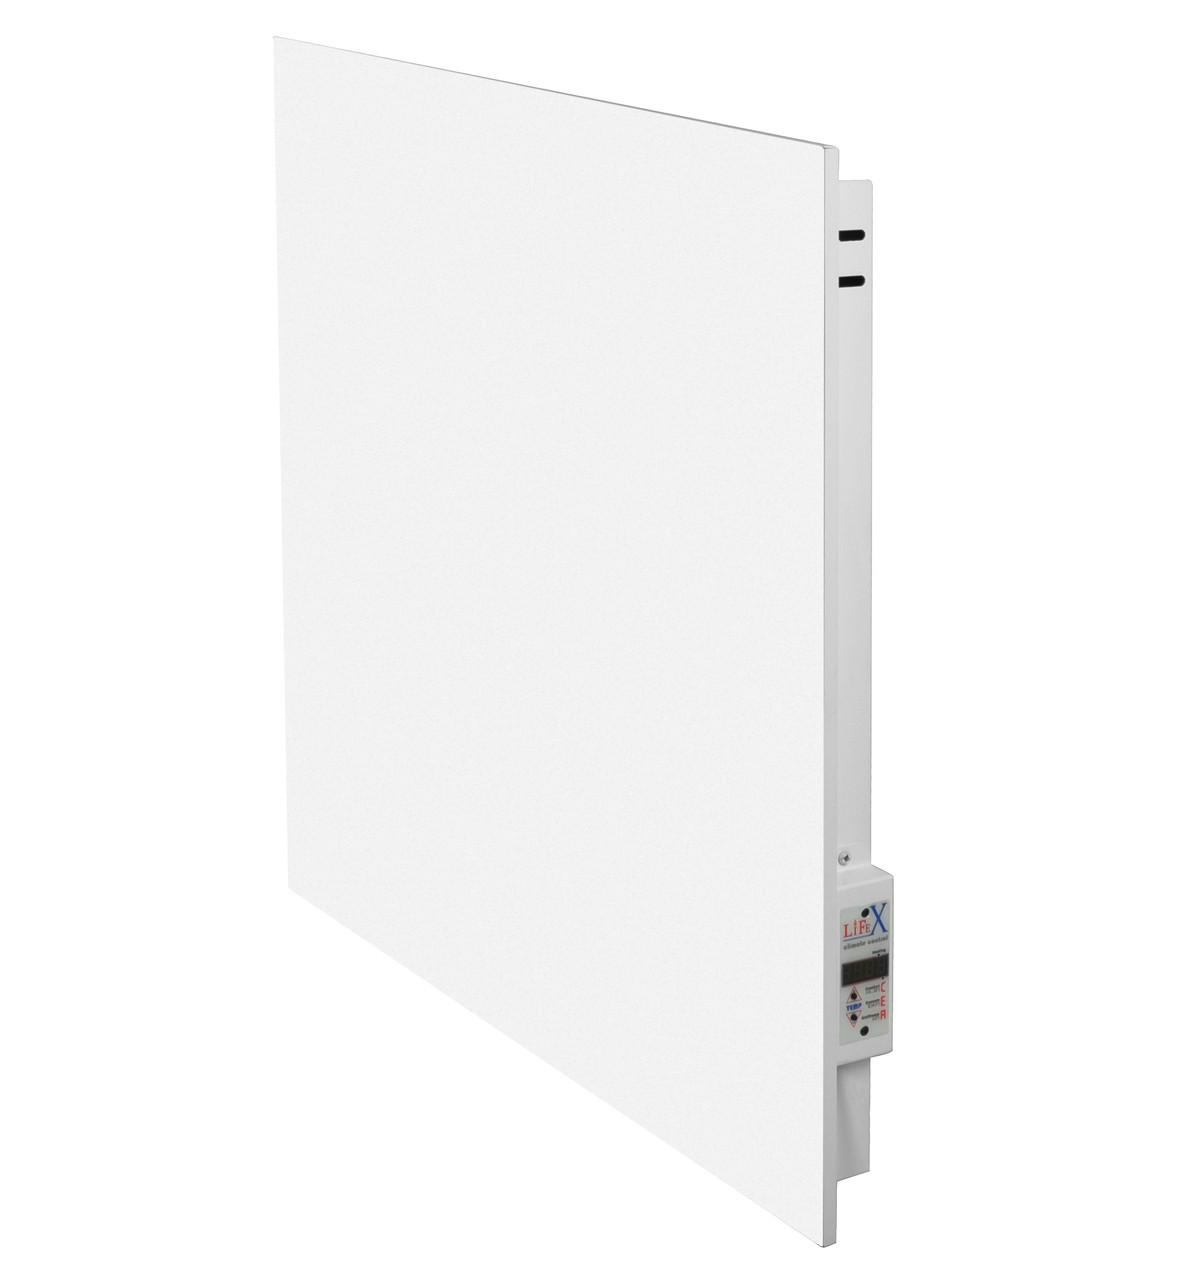 БИО конвектор LIFEX Bio Air ТКП700 (белый) + программатор